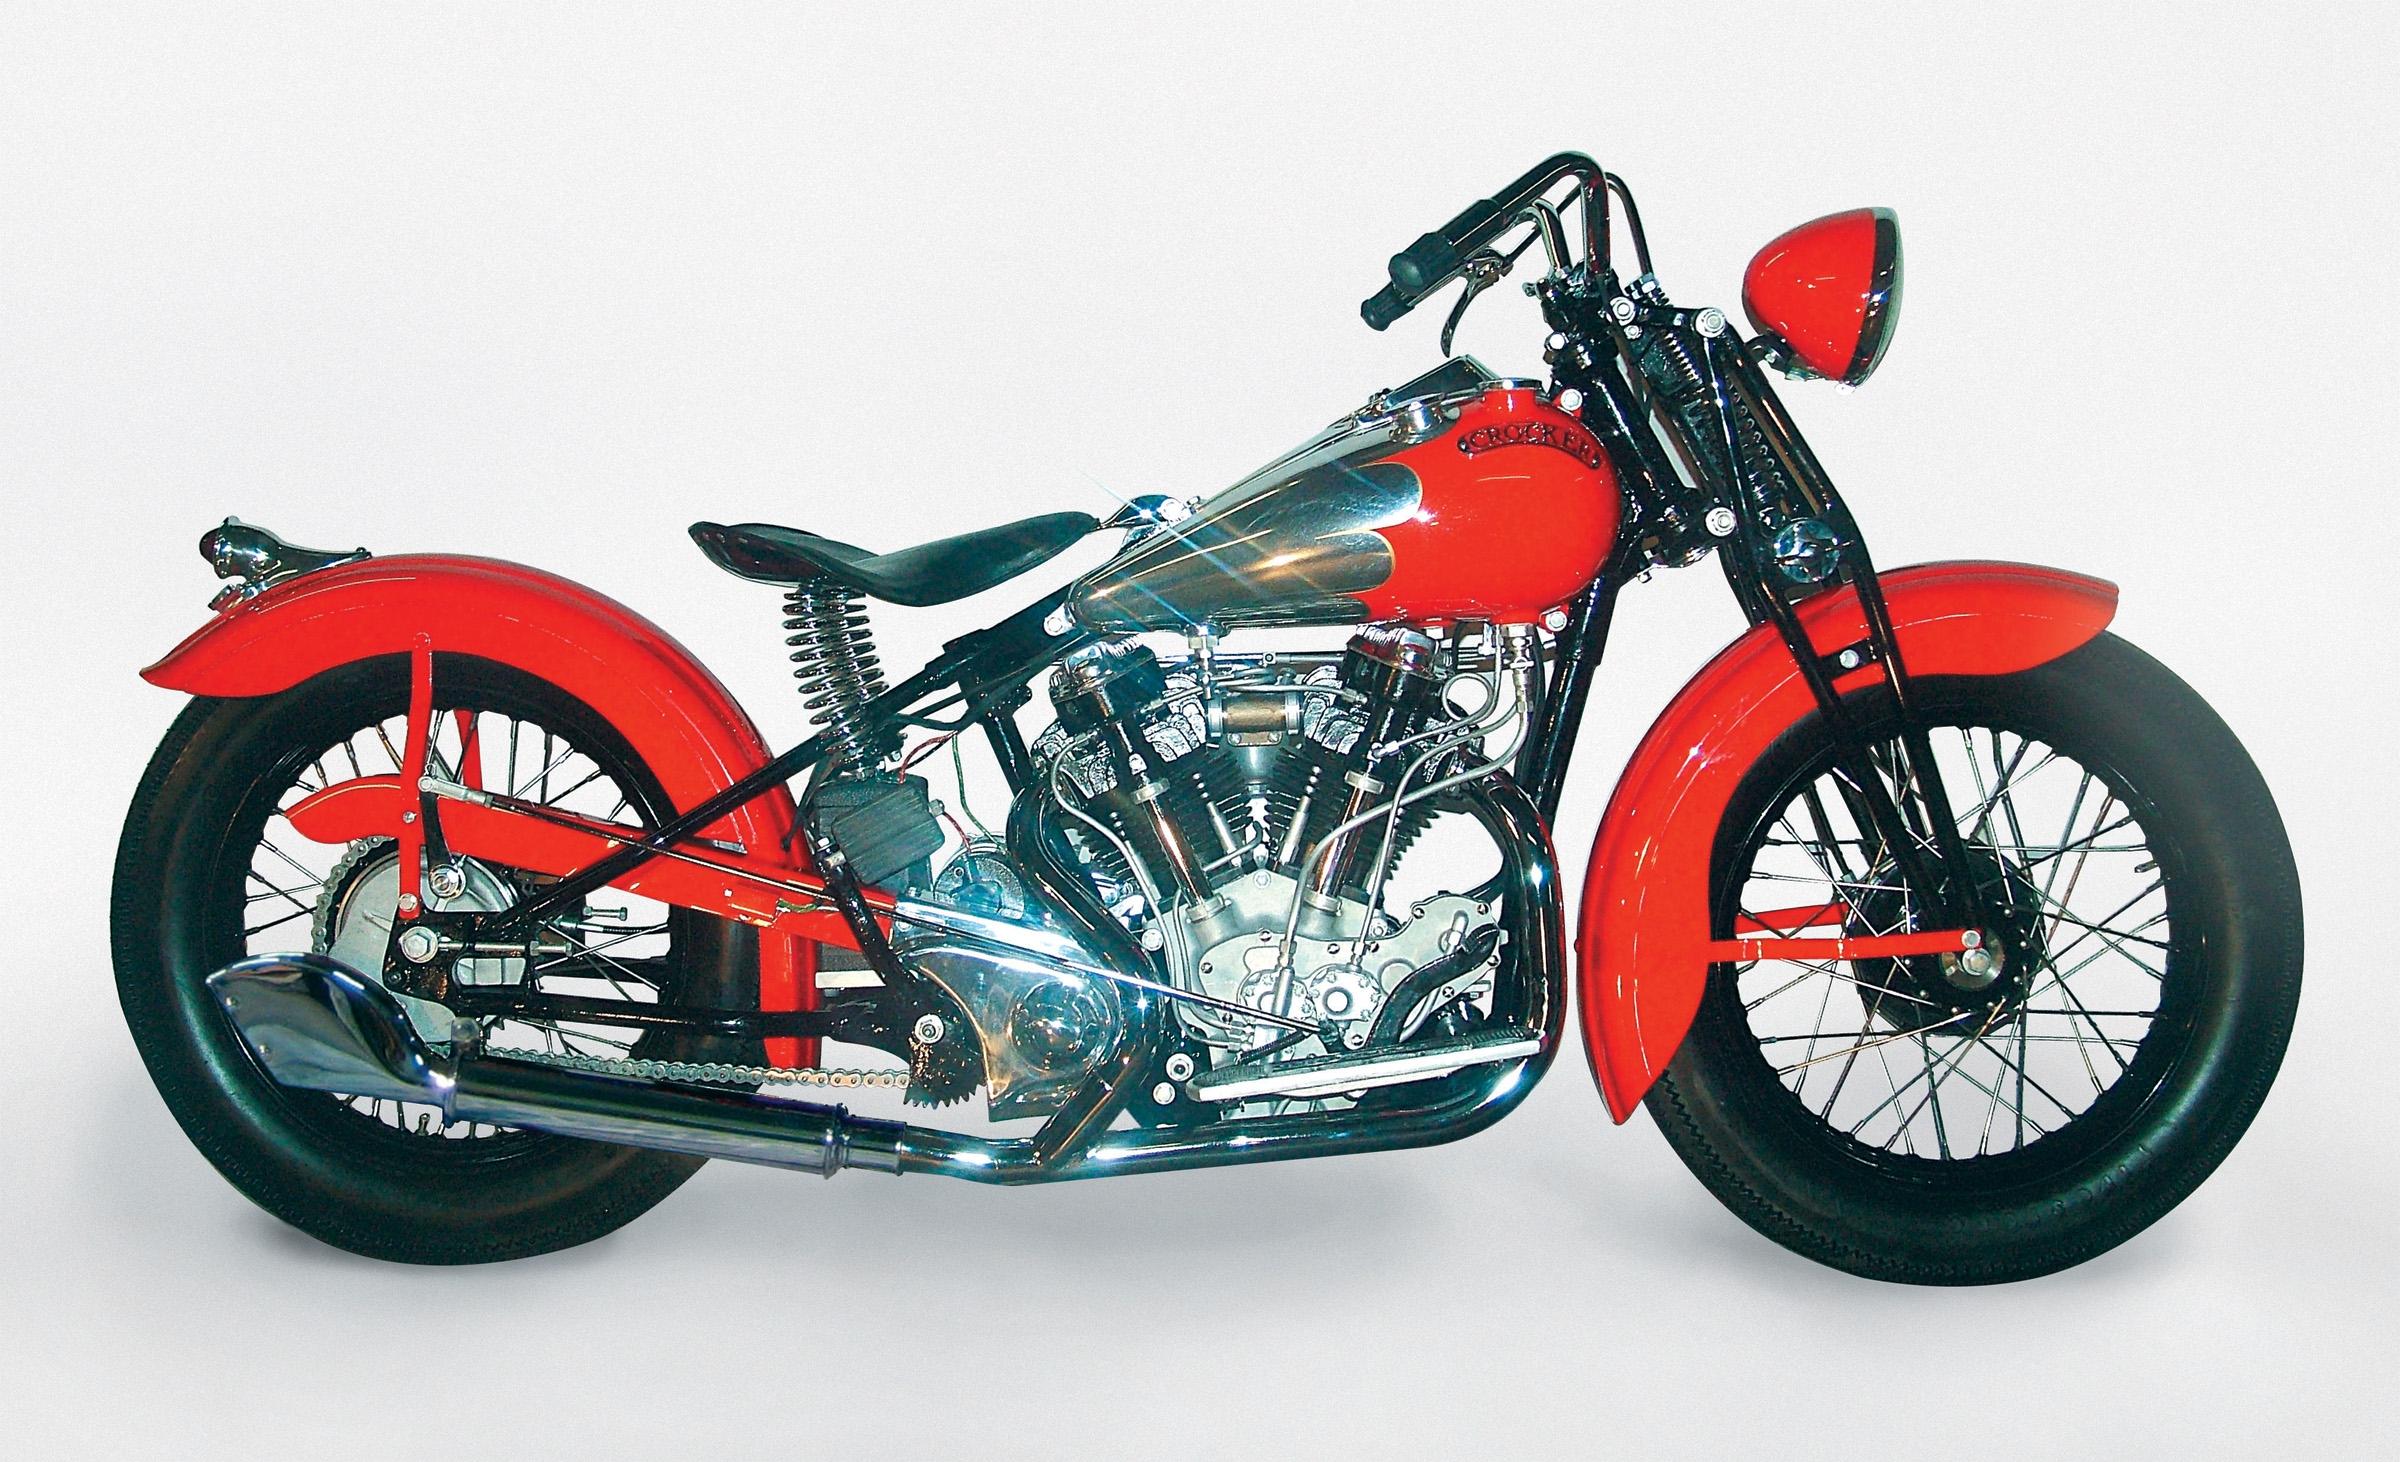 New Crocker Big Tank motorcycle built per the original 1938 factory specifications.